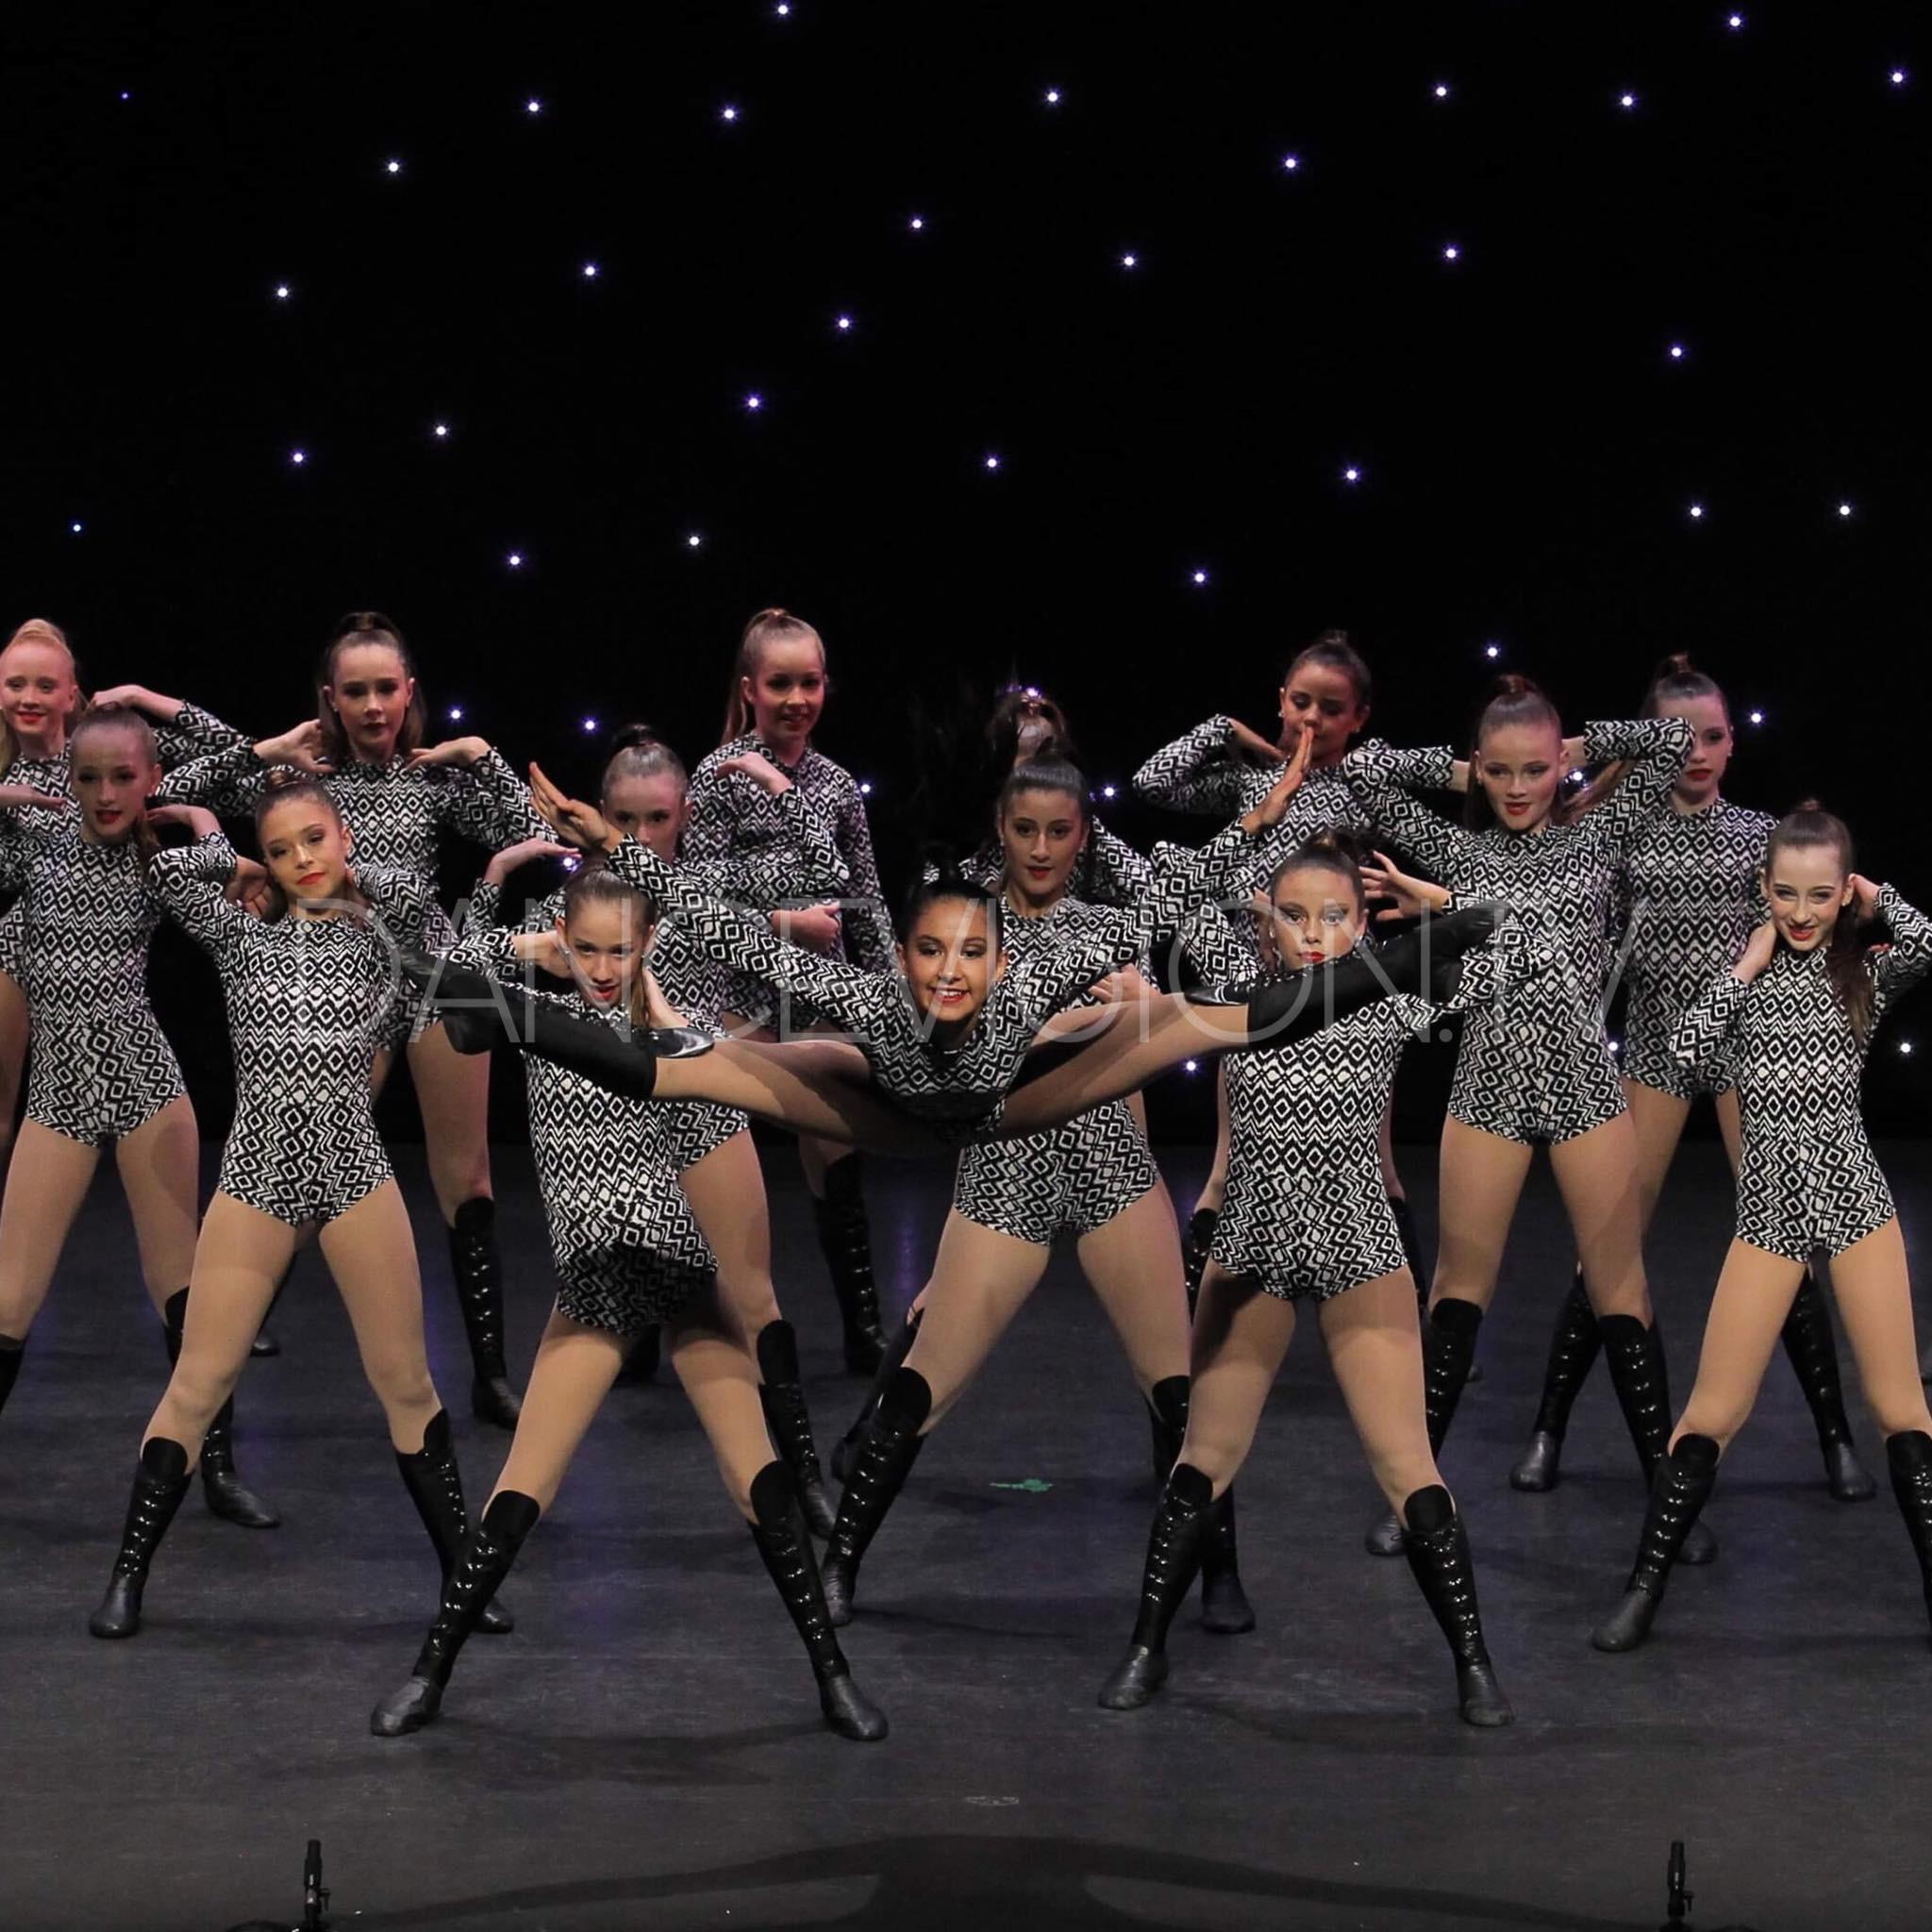 Amazing jazz dancers - Jazz Dance competition teams - commercial dance